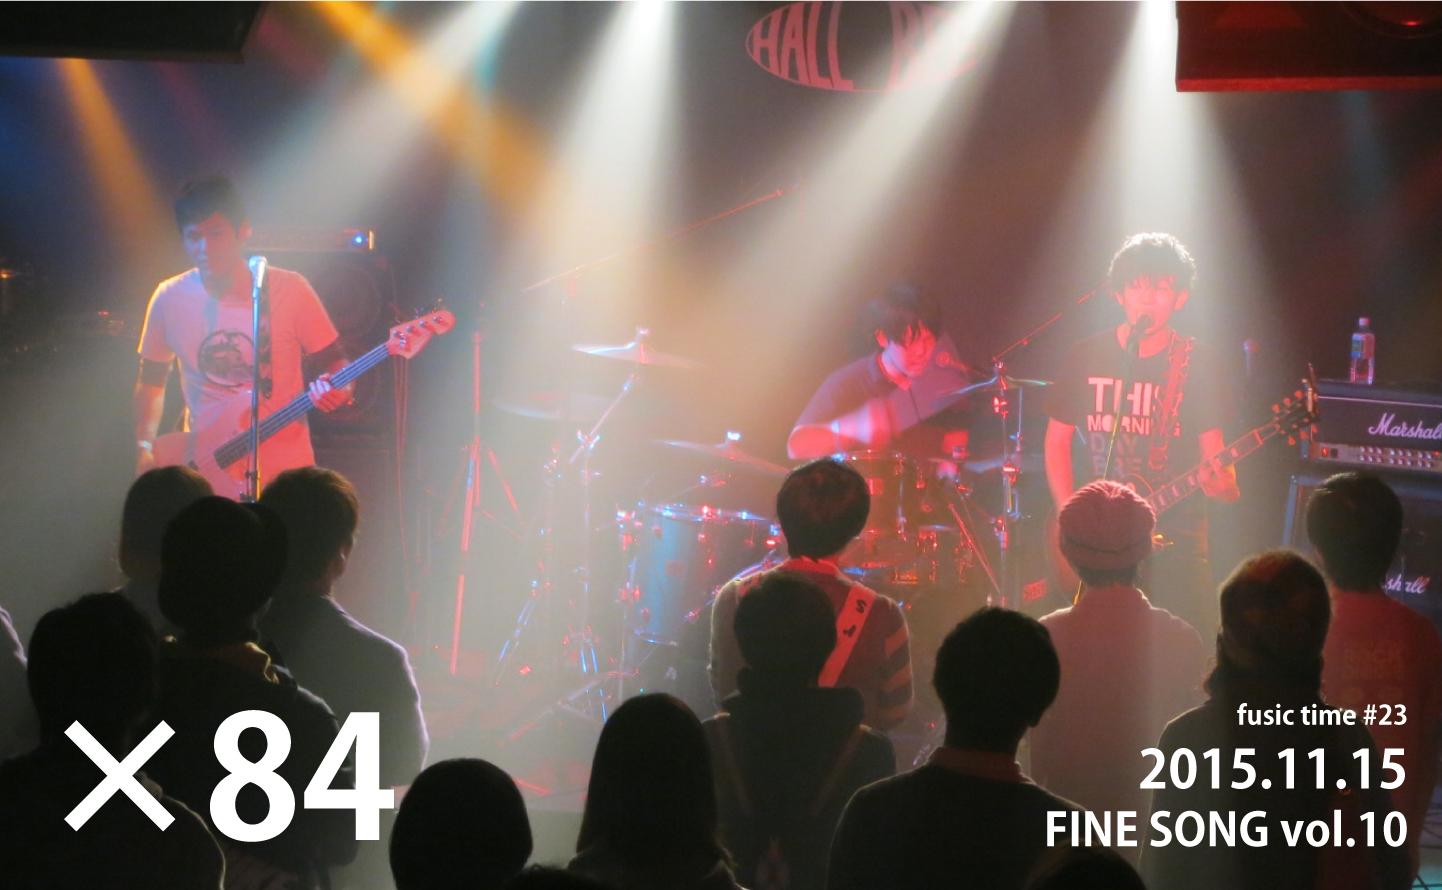 fusictime23